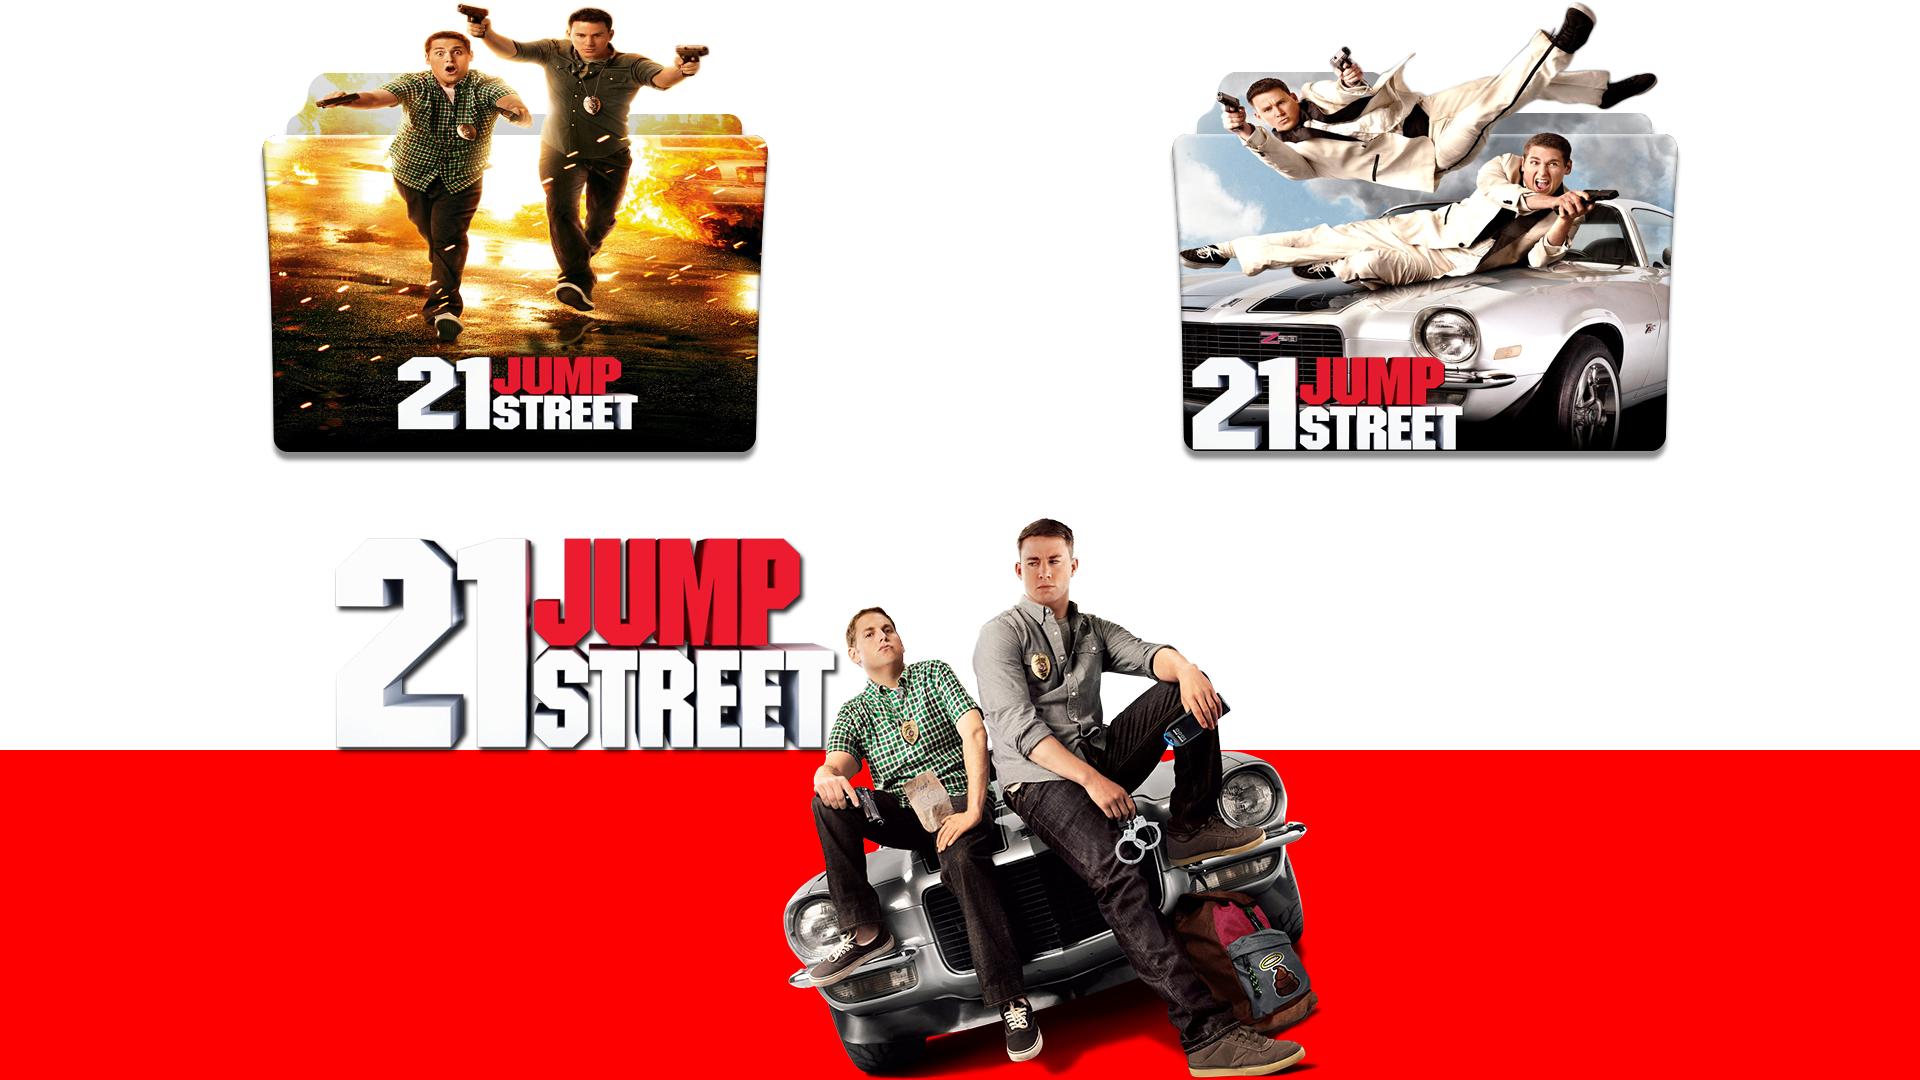 21 Jump Street 2012 Folder Icon By Jaxteller22 On Deviantart